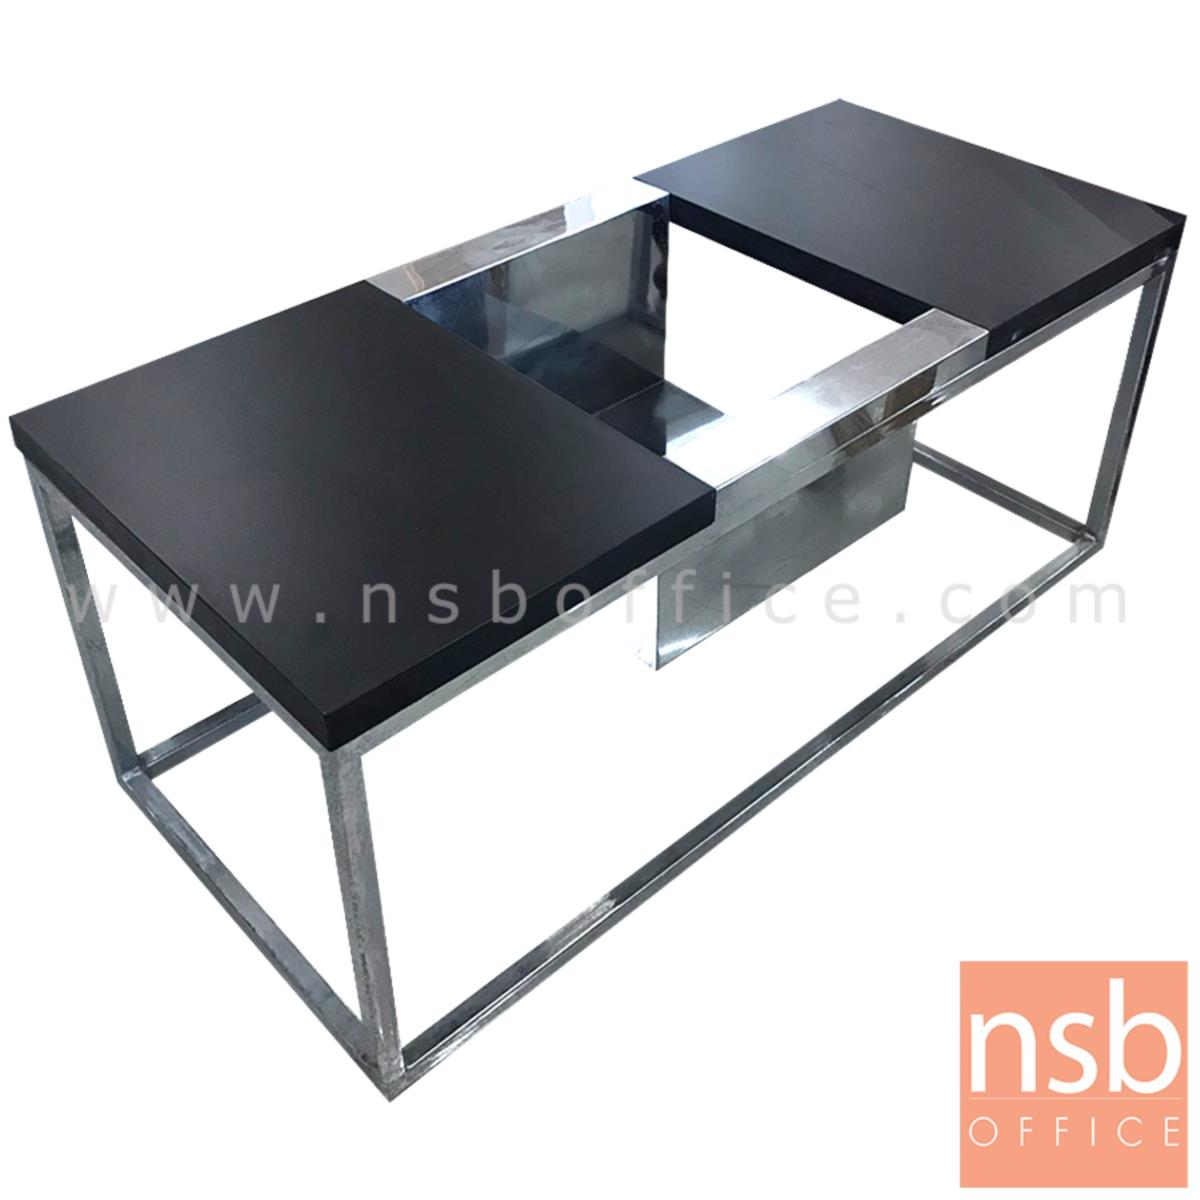 L10A162:โต๊ะกลางโมเดิร์น  ขนาด 90W*38H cm. ขาเหล็ก